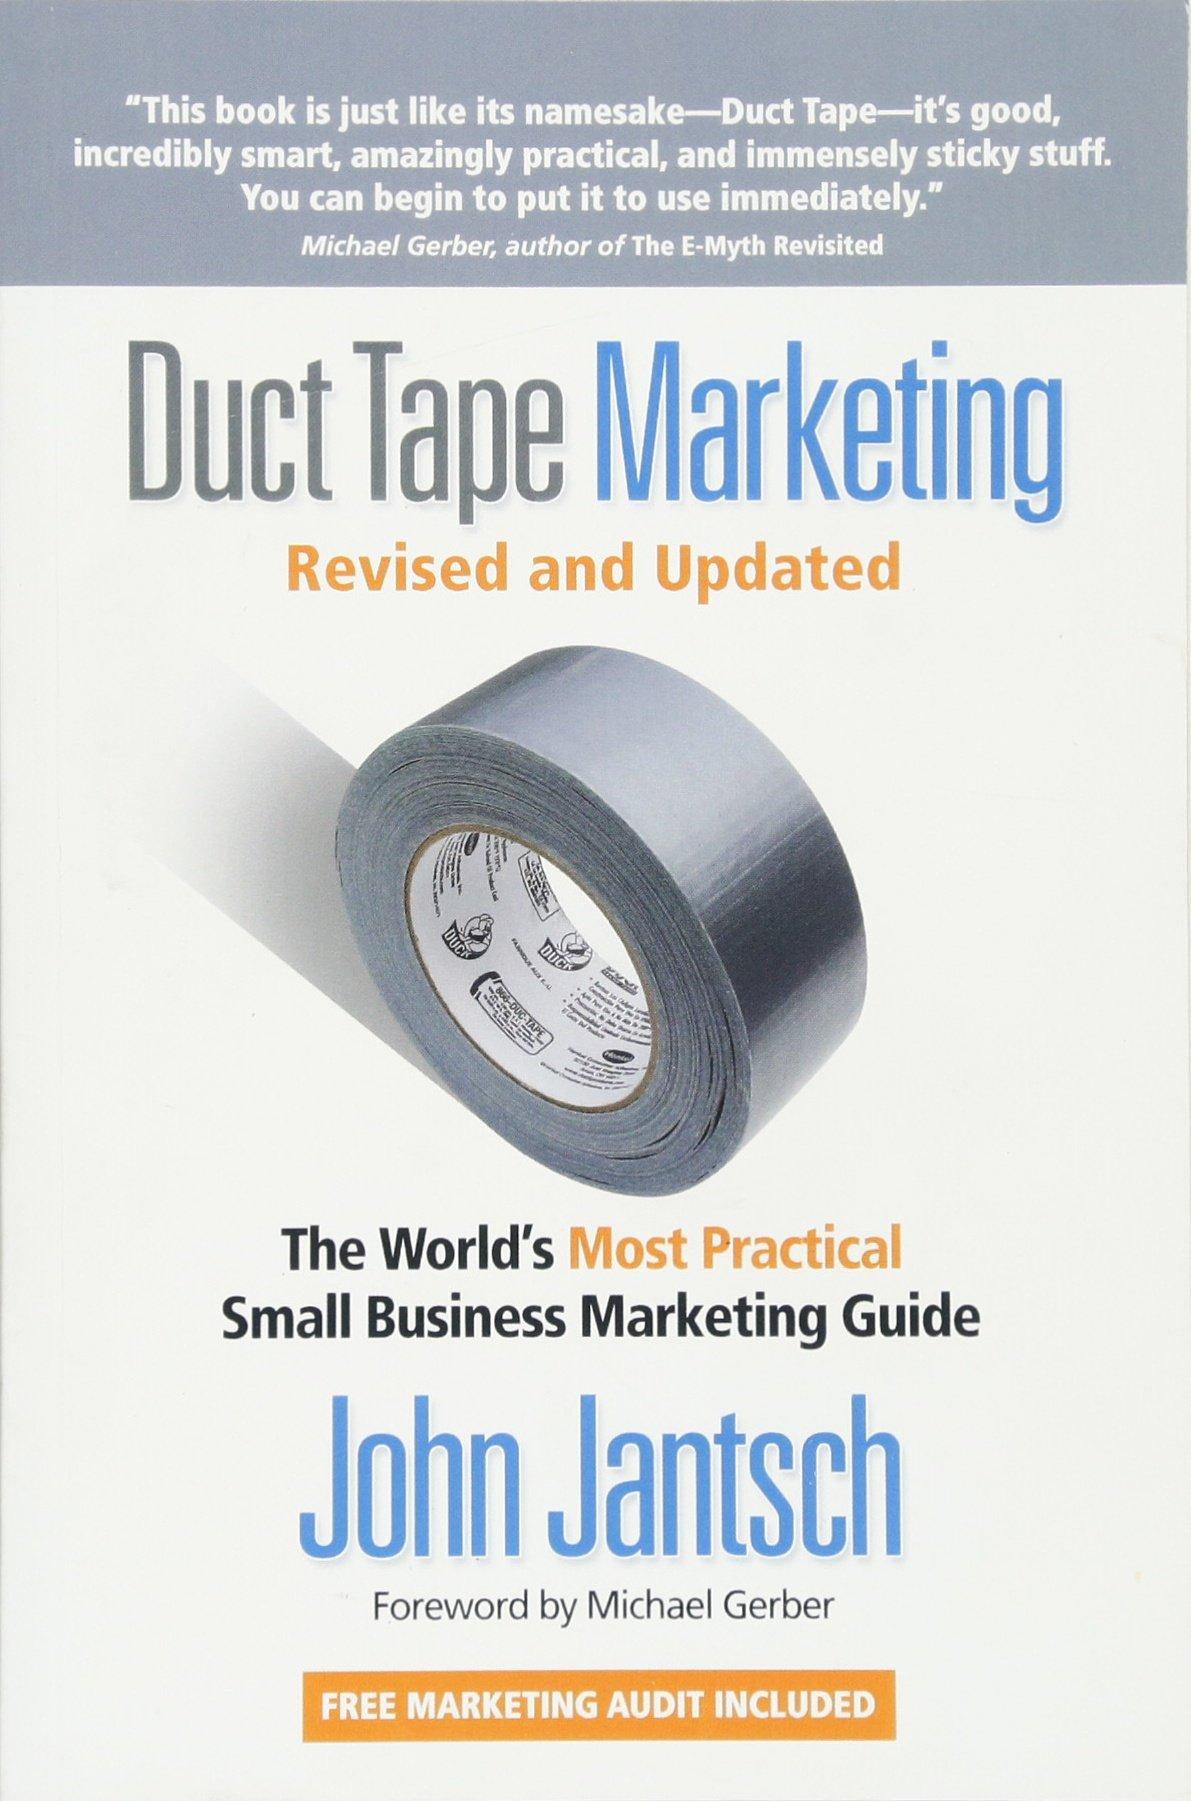 Duct tape marketing